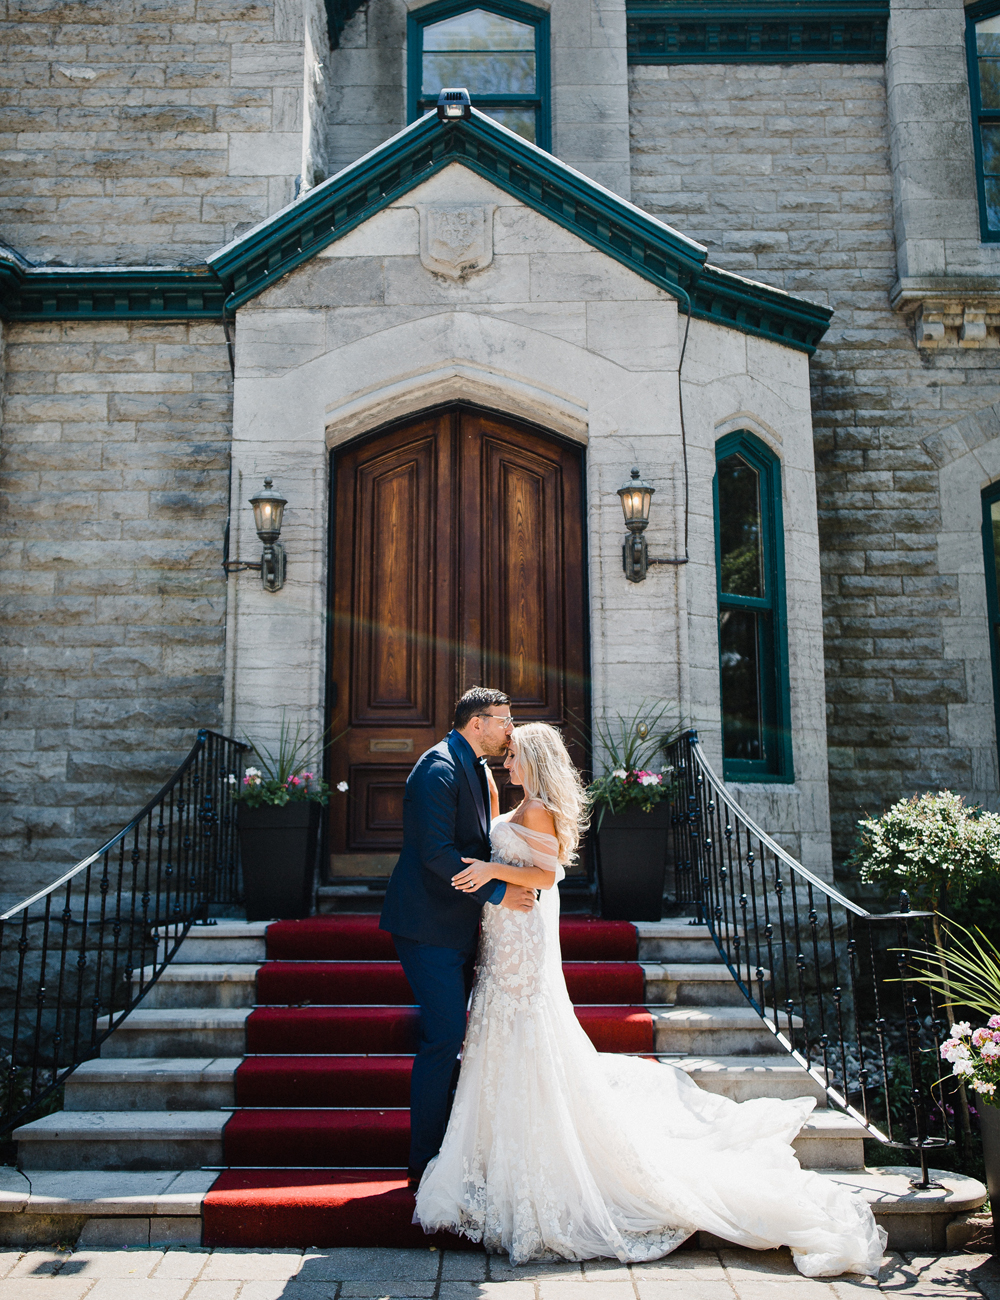 wedding-dream-montreal-caroline-elie-dress